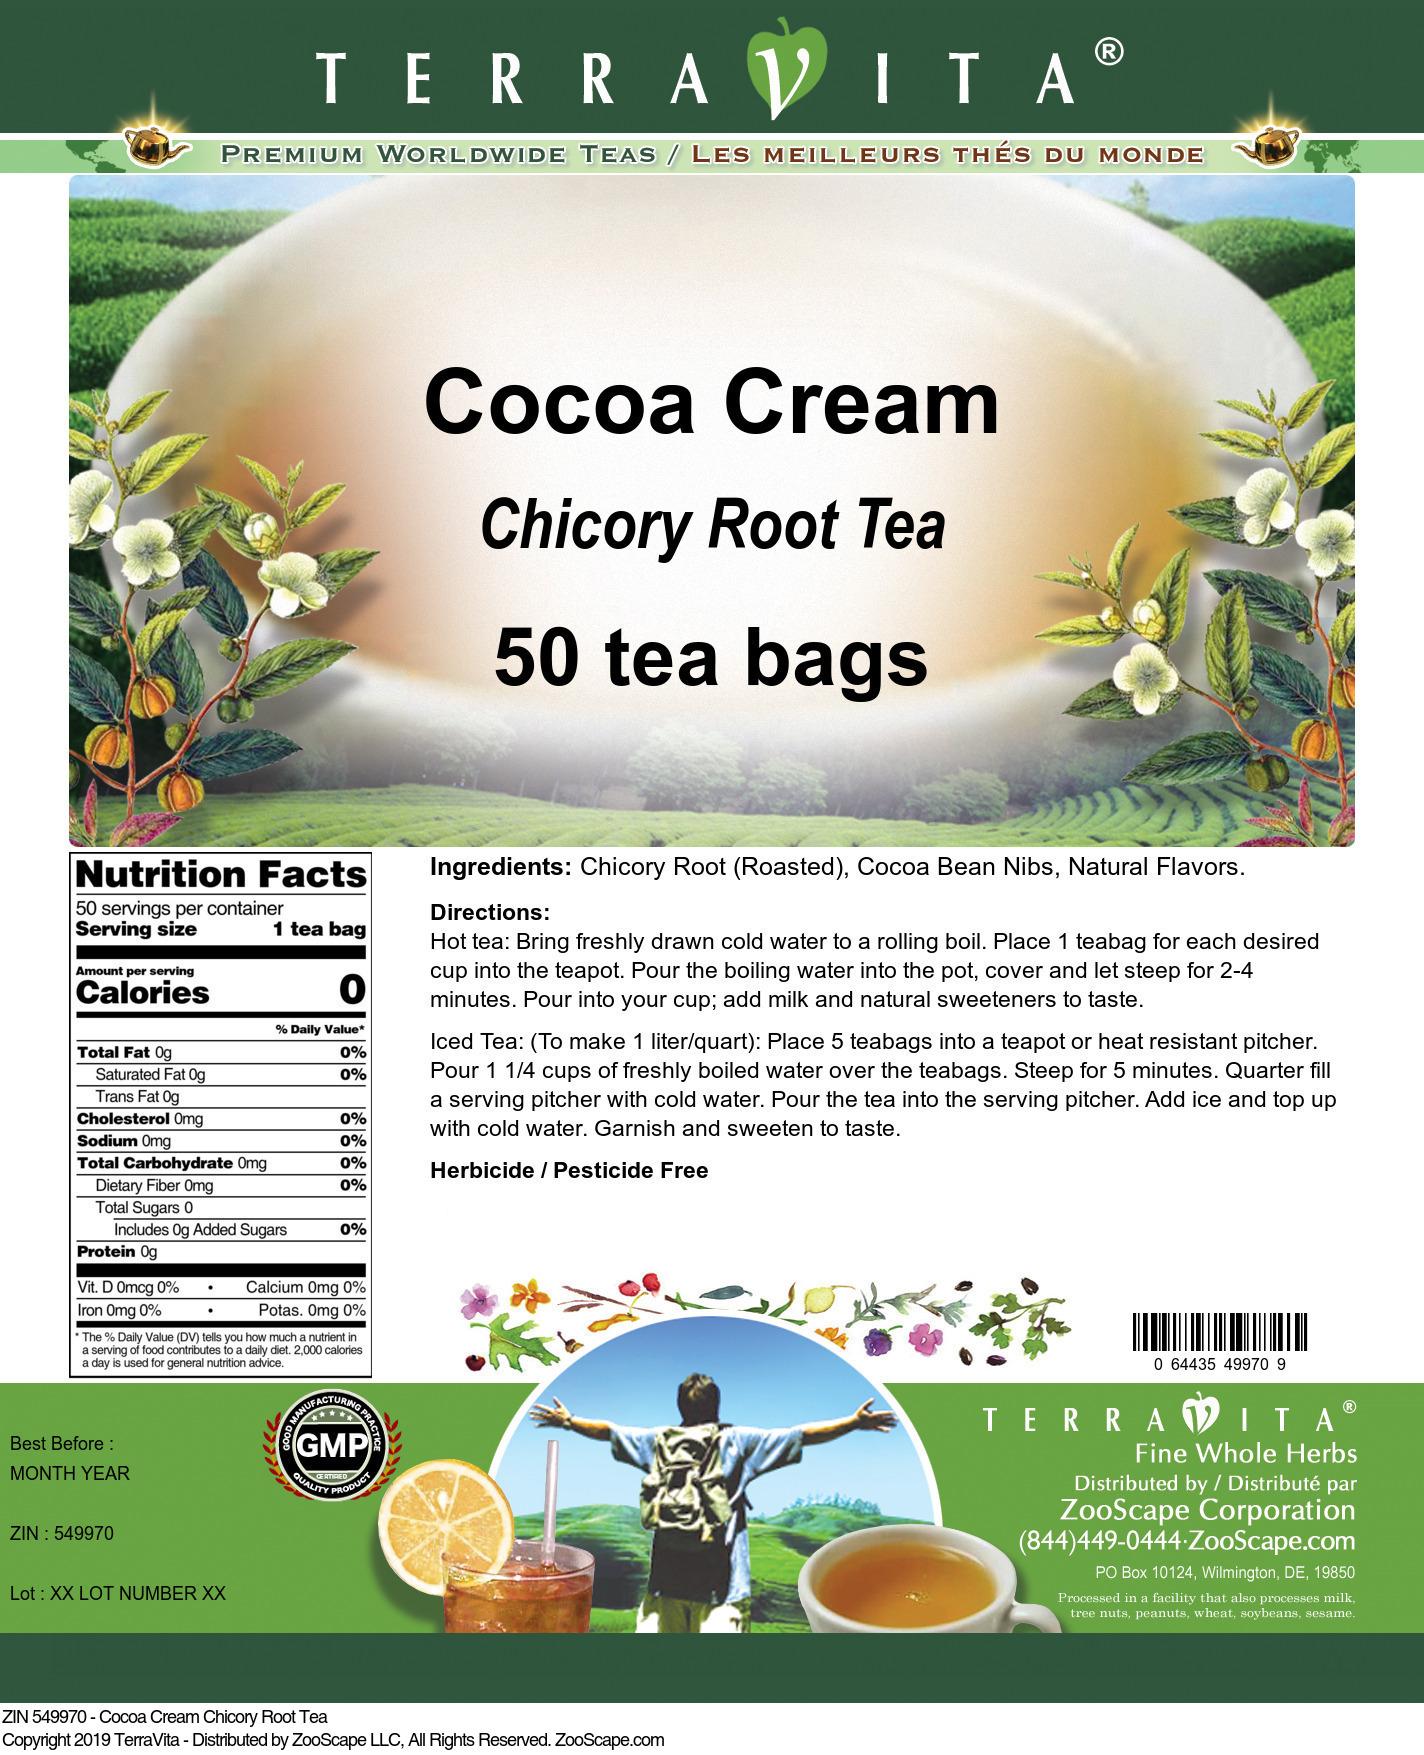 Cocoa Cream Chicory Root